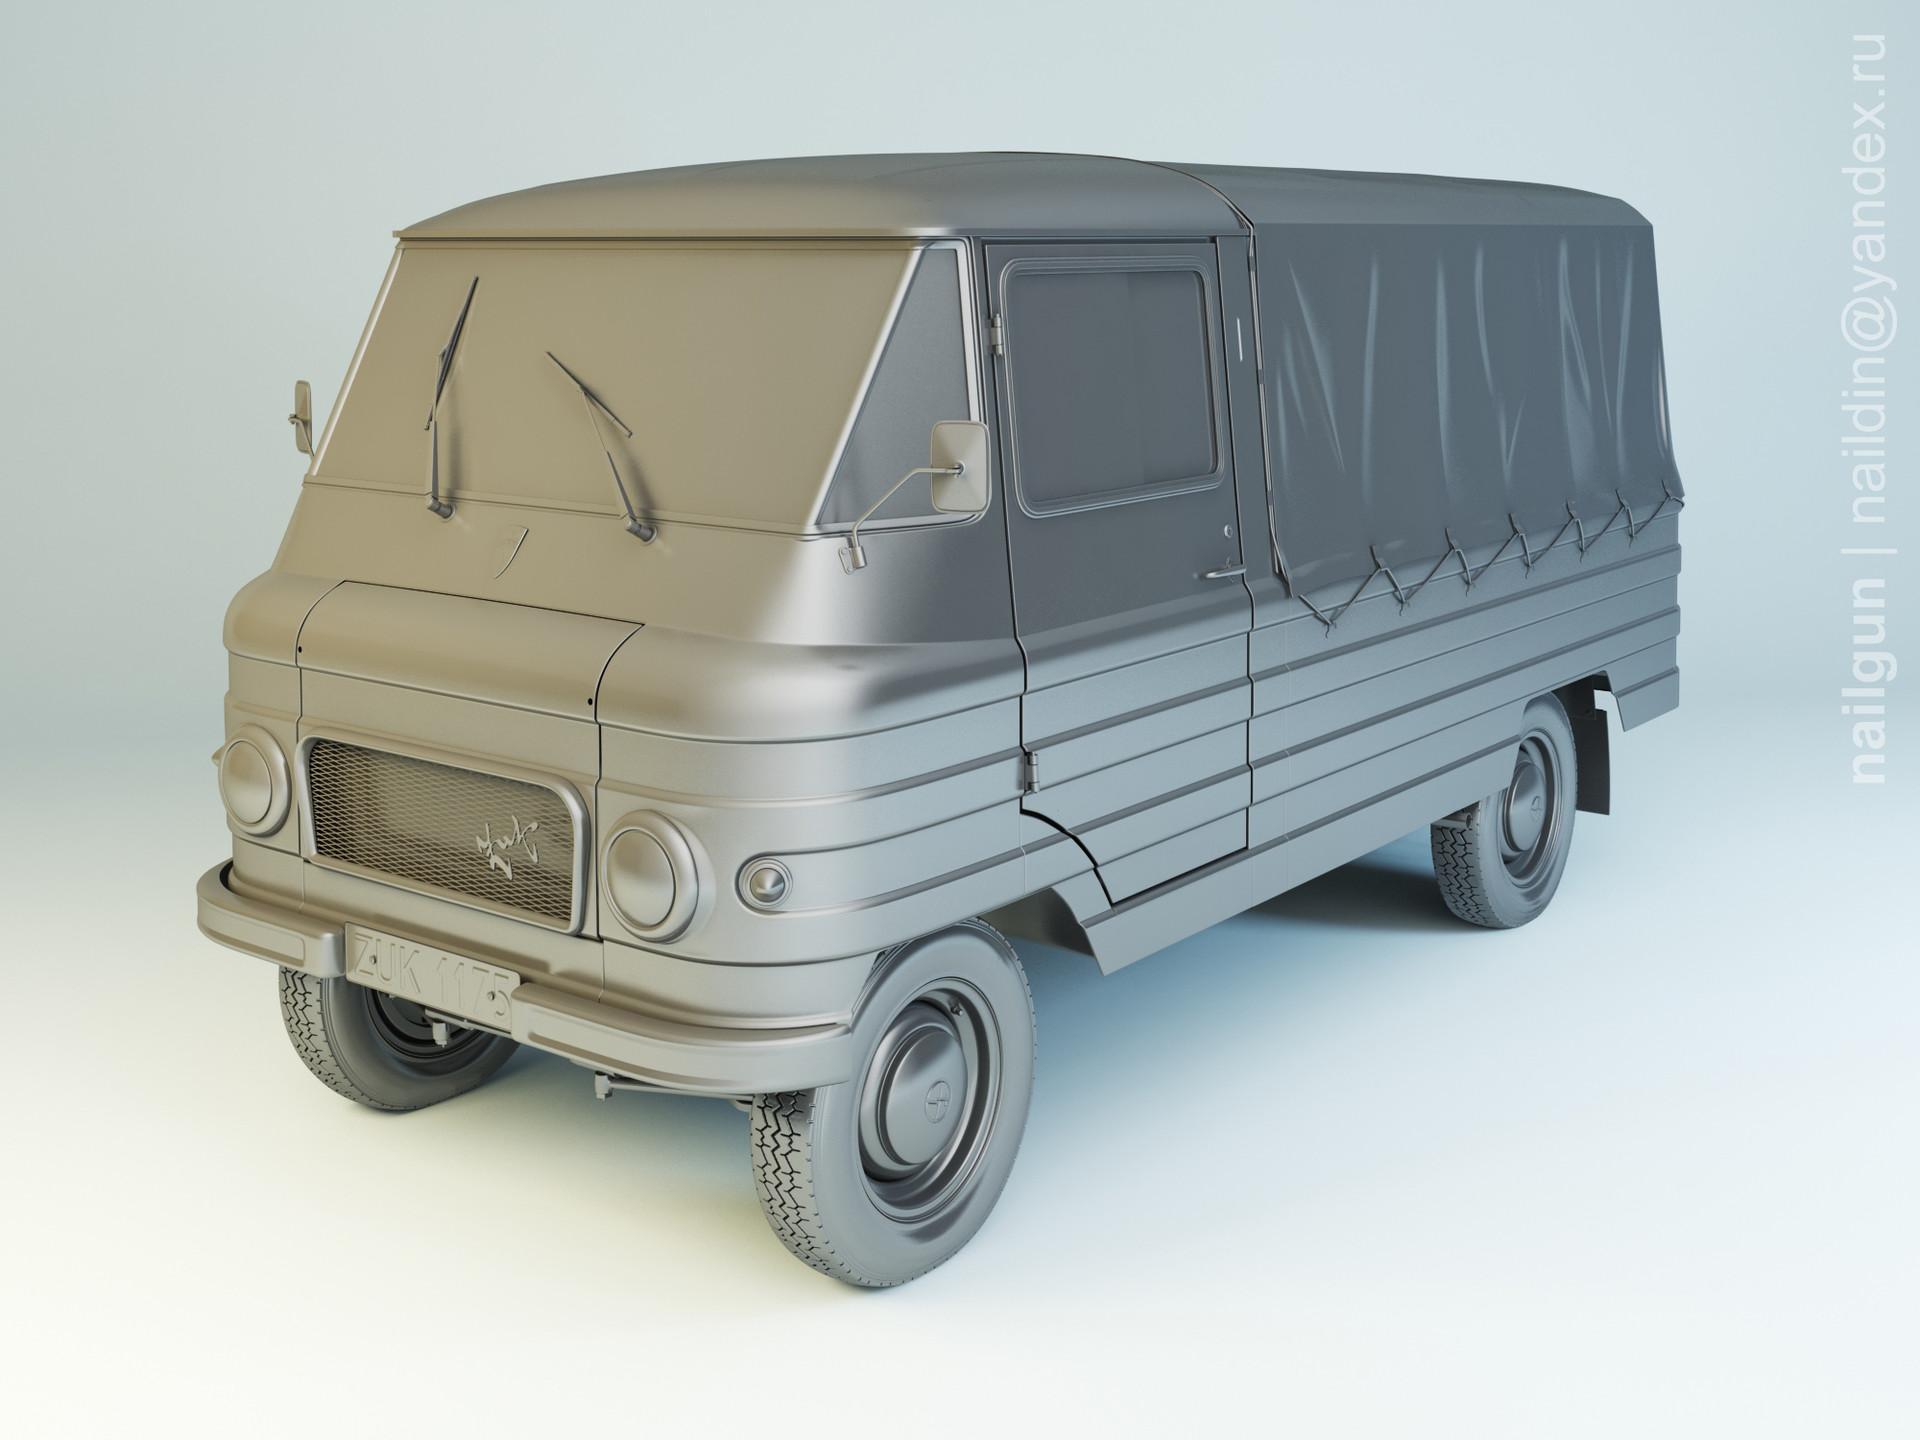 Nail khusnutdinov als 179 001 zuk a03 modelling 0